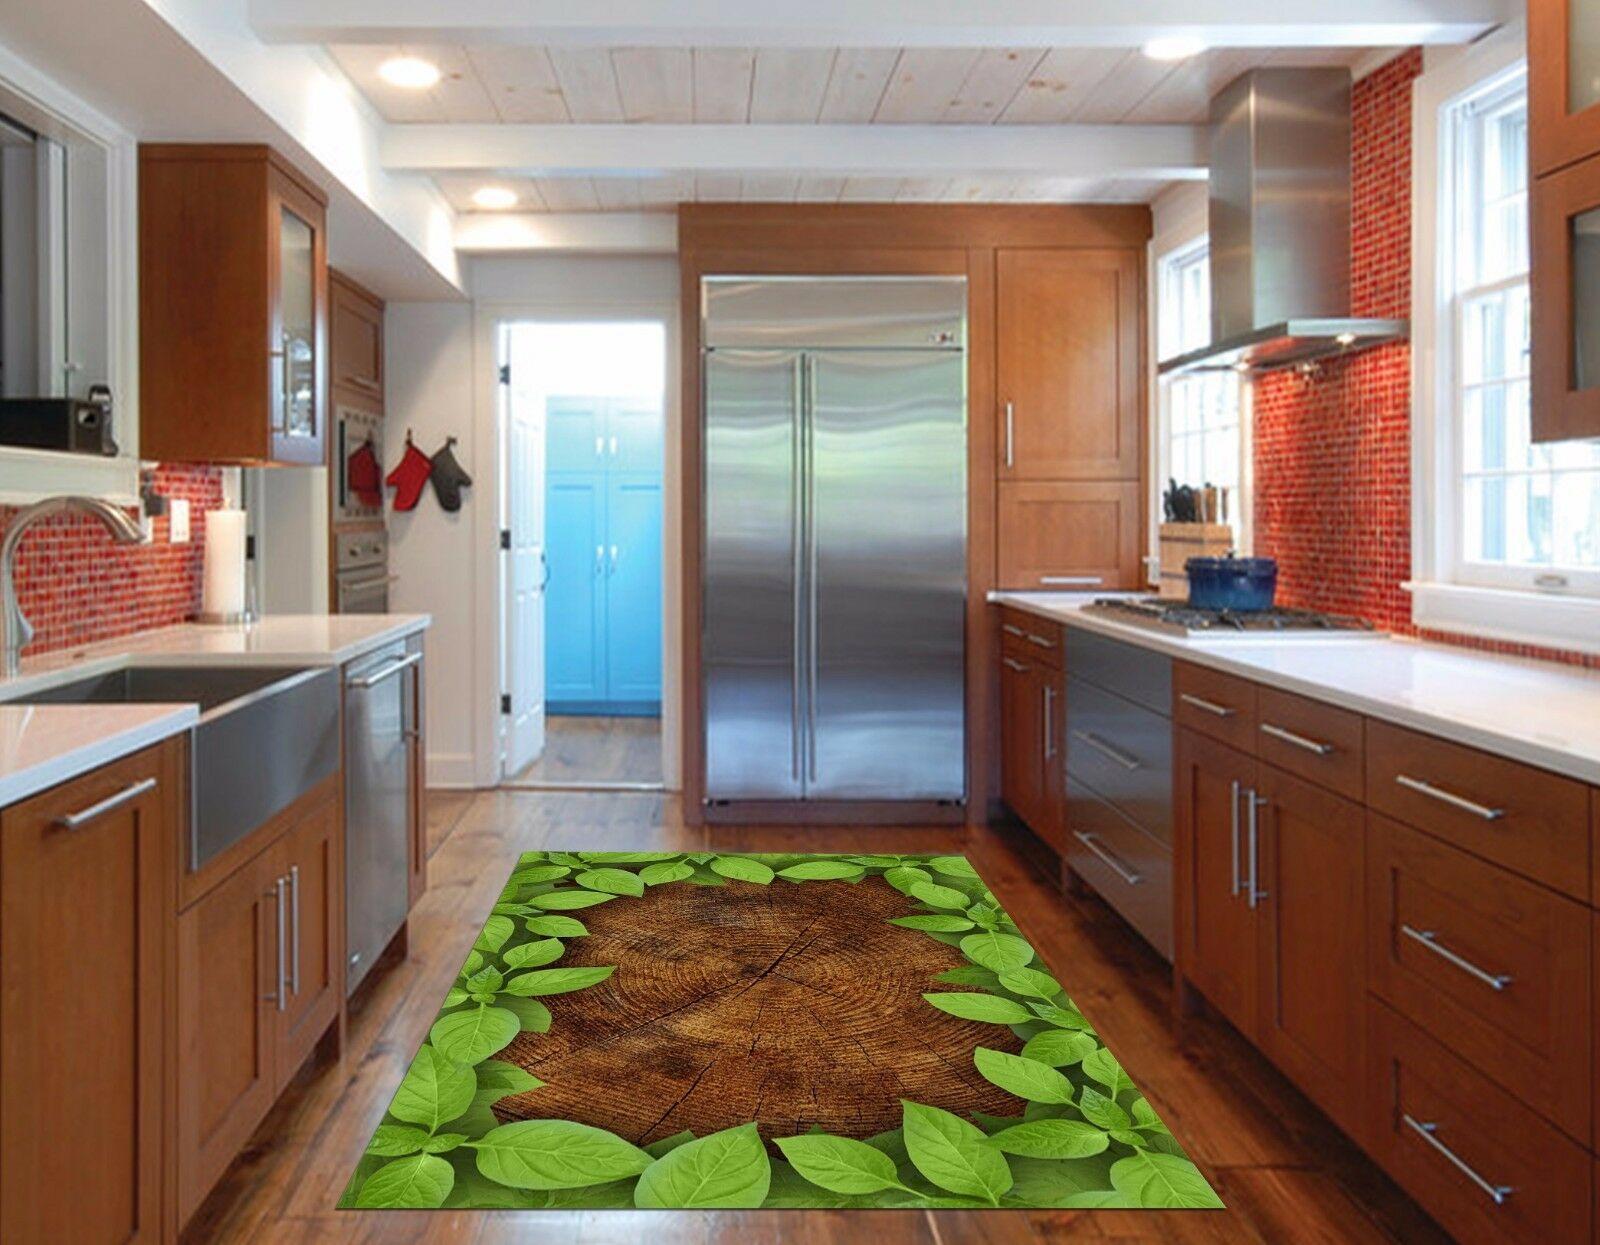 3D Leaves Wood 85 Kitchen Mat Floor Murals Wall Print Wall AJ WALLPAPER UK Kyra